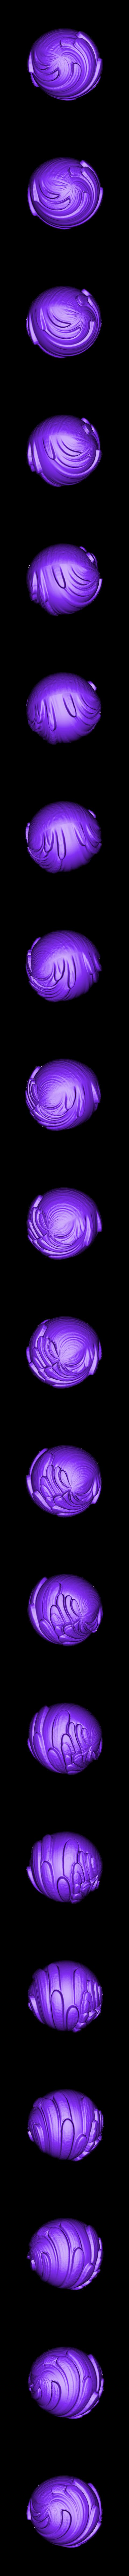 pla2.stl Download free STL file Alien planets • 3D print model, ferjerez3d